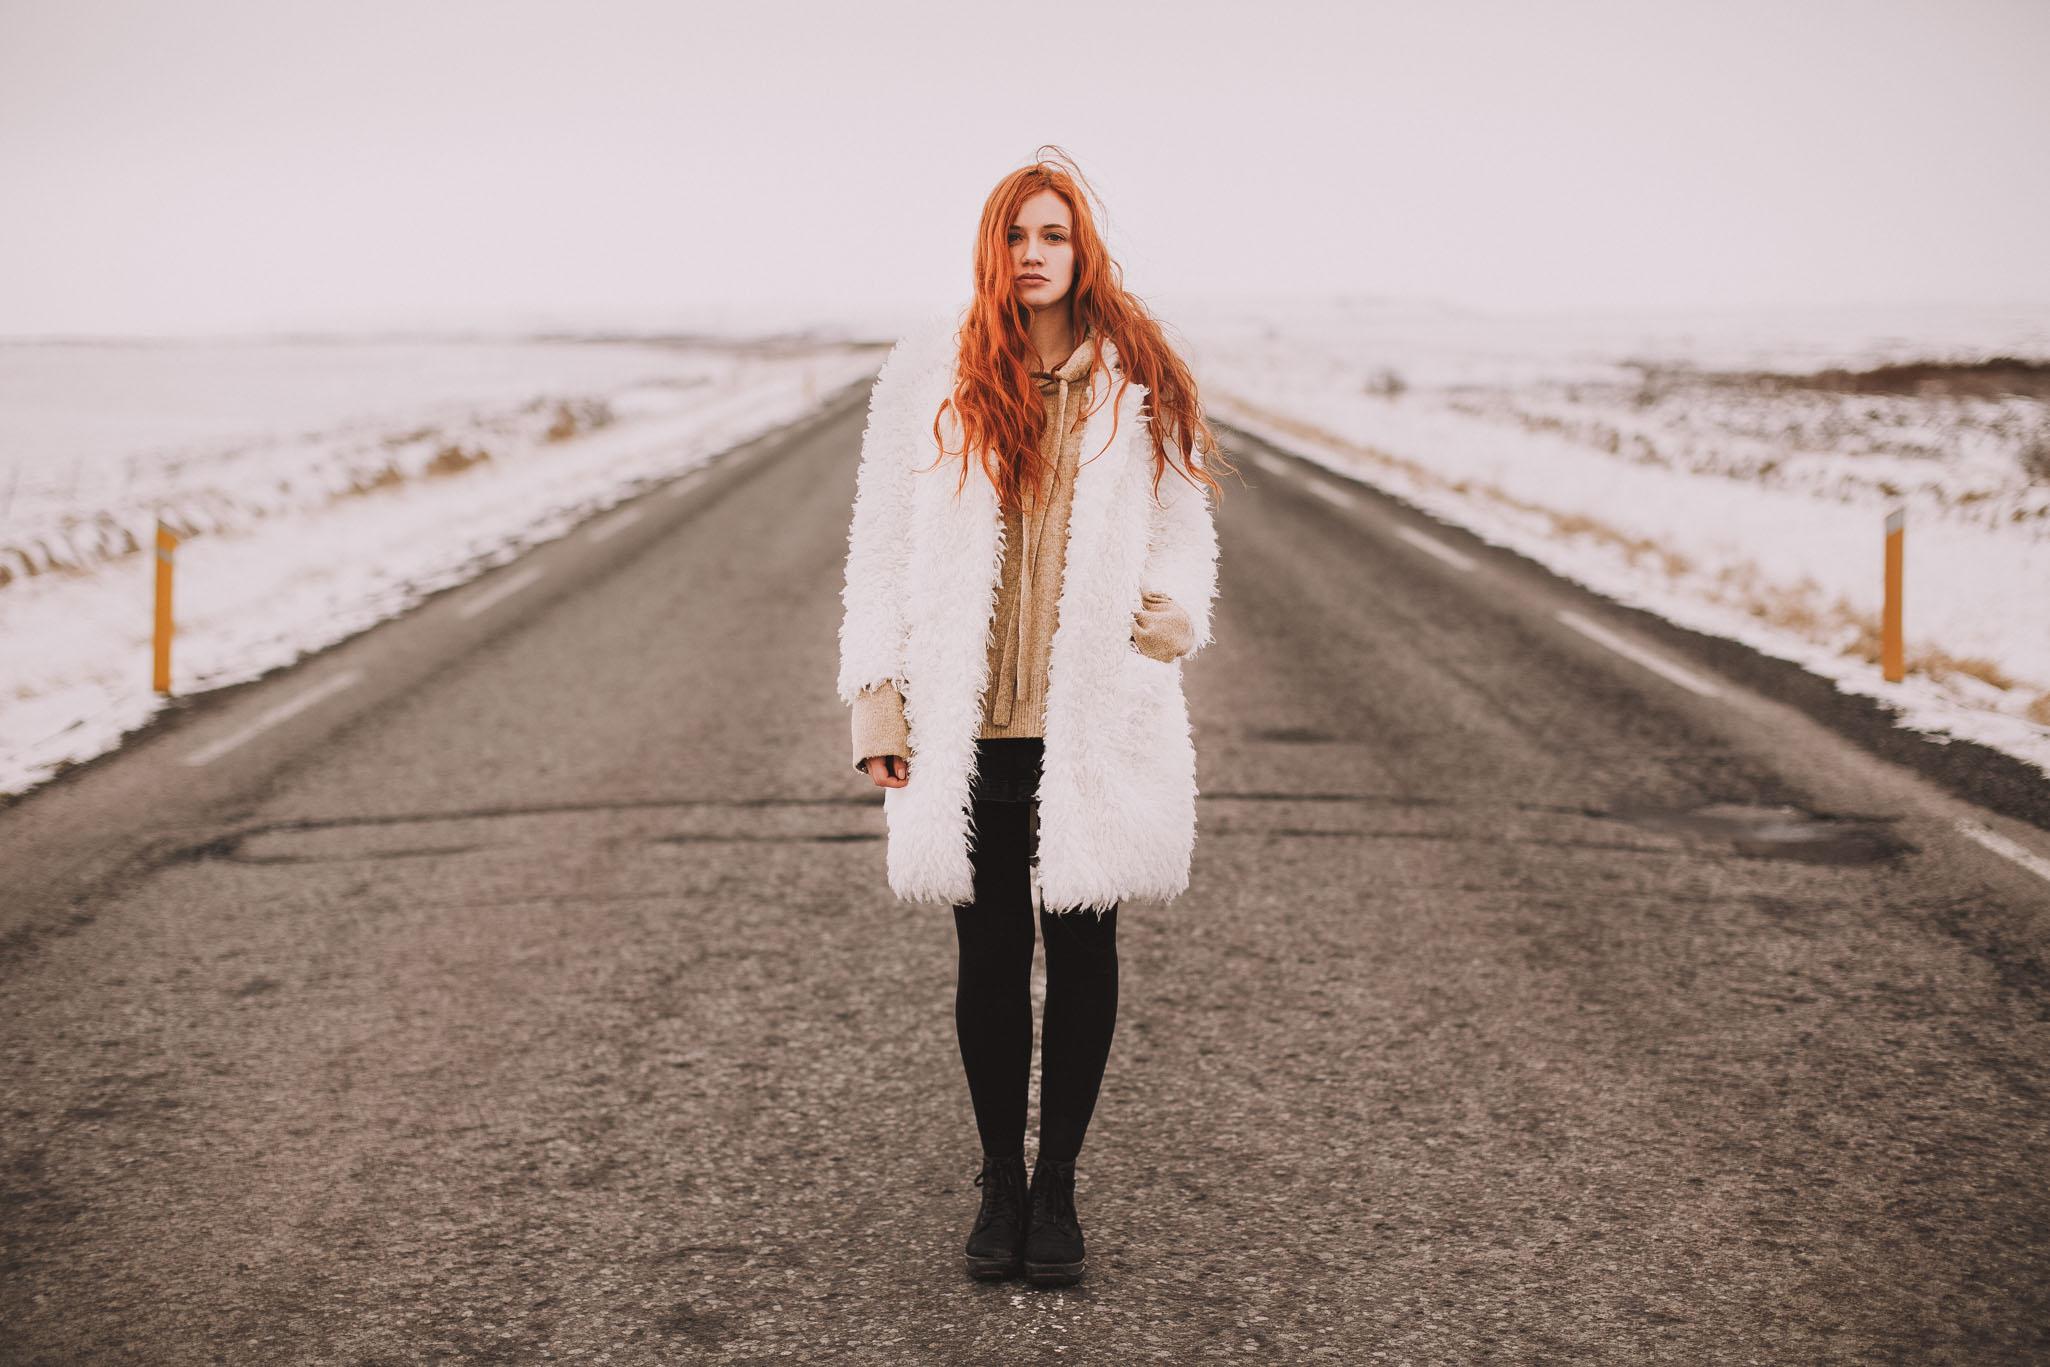 Road-trip-Islande-Iceland-Voyage-Travel-Portrait-Jérémy-Boyer-Geysir-Geysers-Horse-snow-ice-Gullfoss-5.jpg